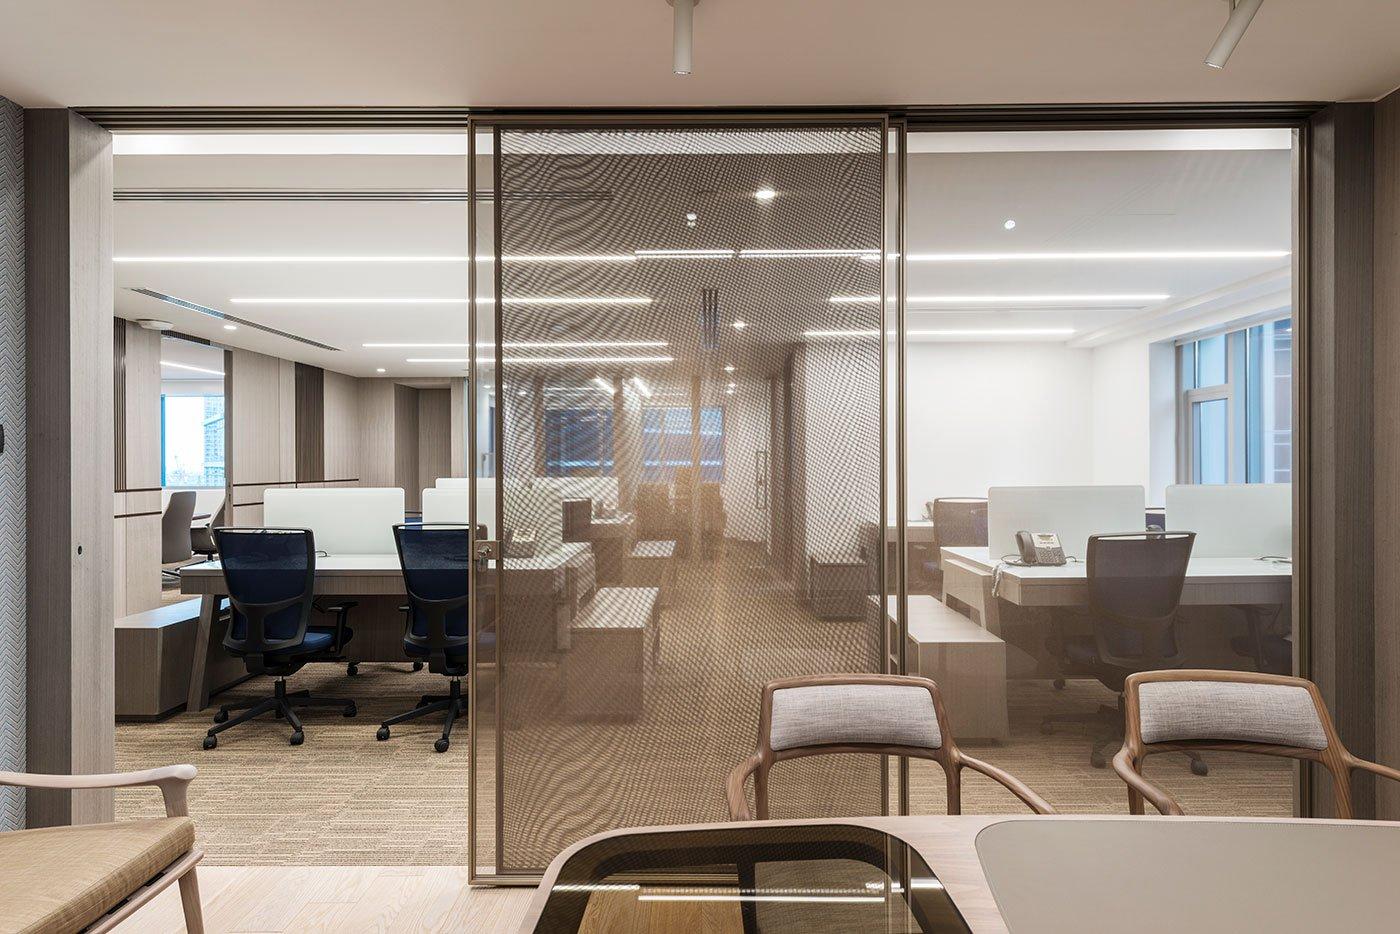 motif interior design photography